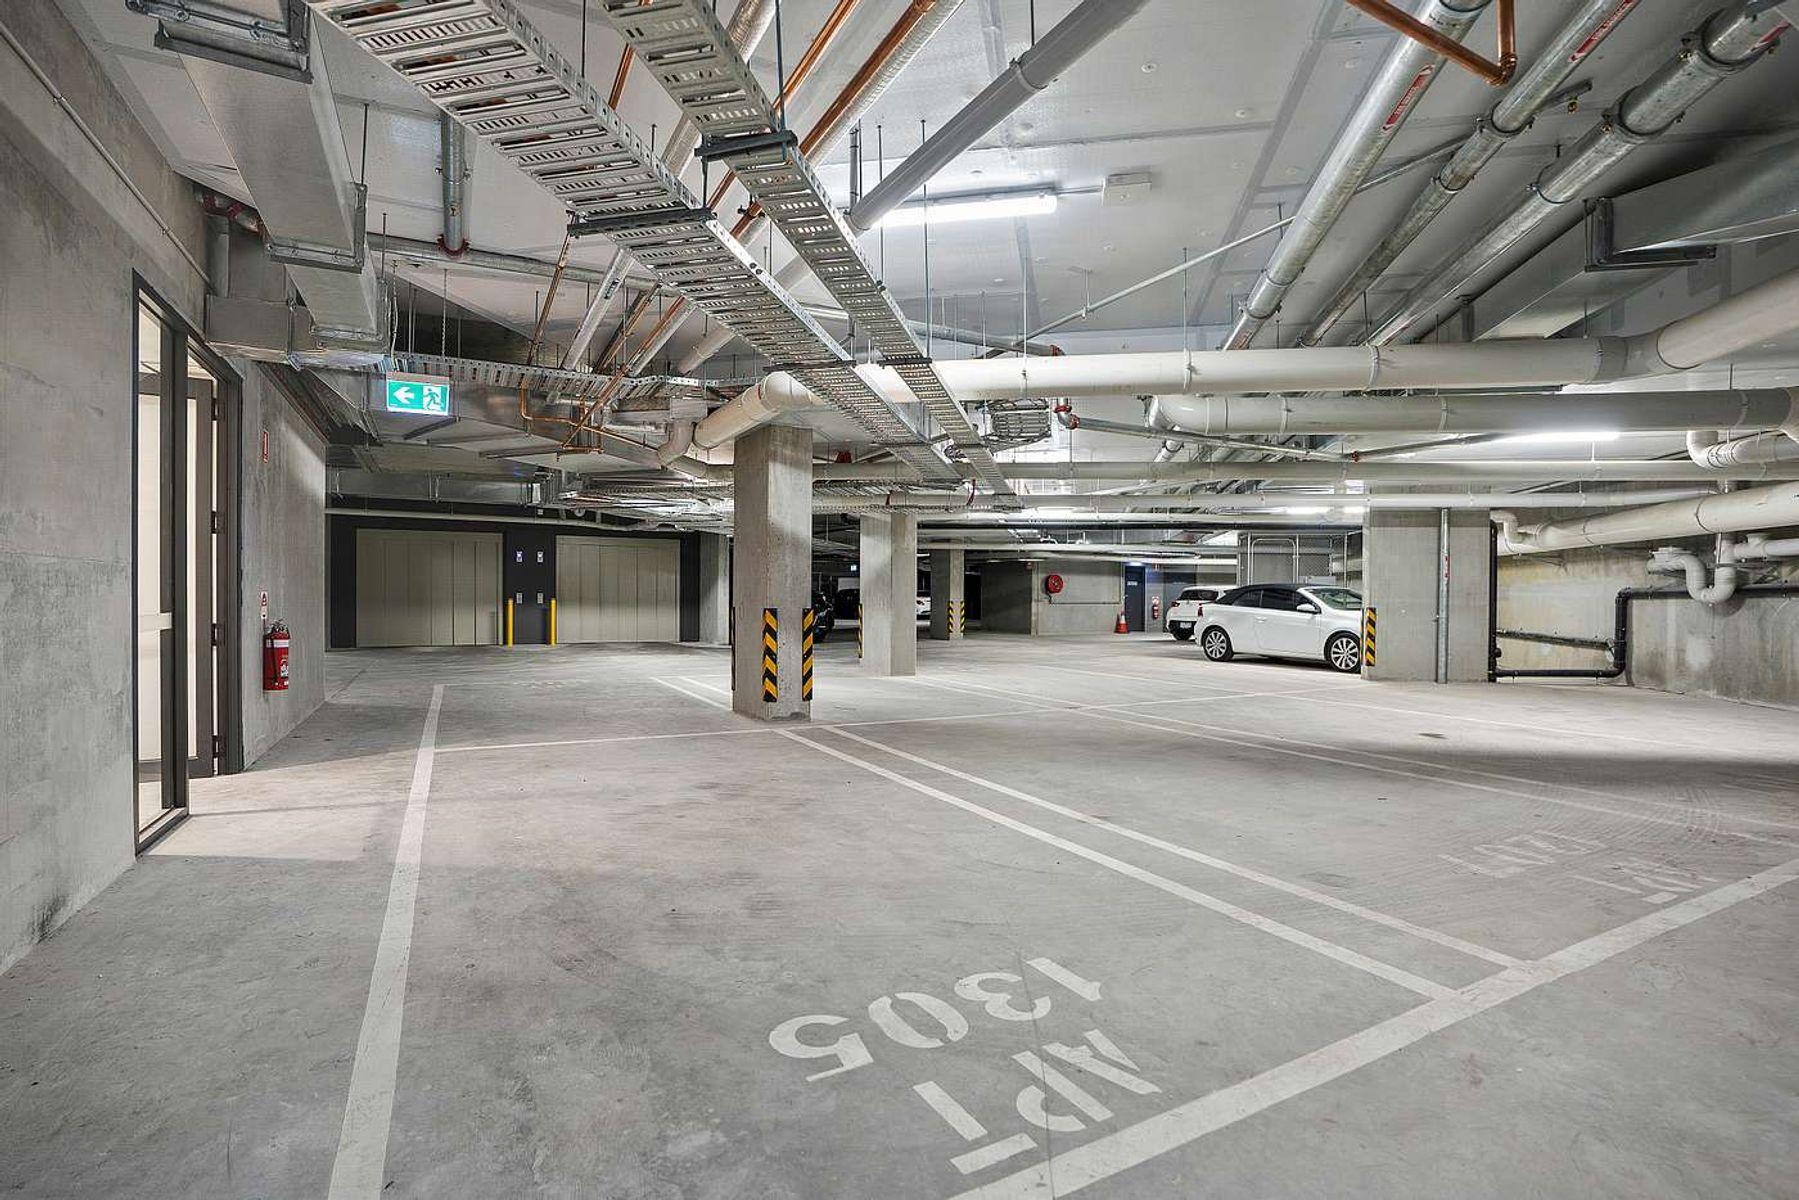 18/1305 Malone Street, Geelong, VIC 3220